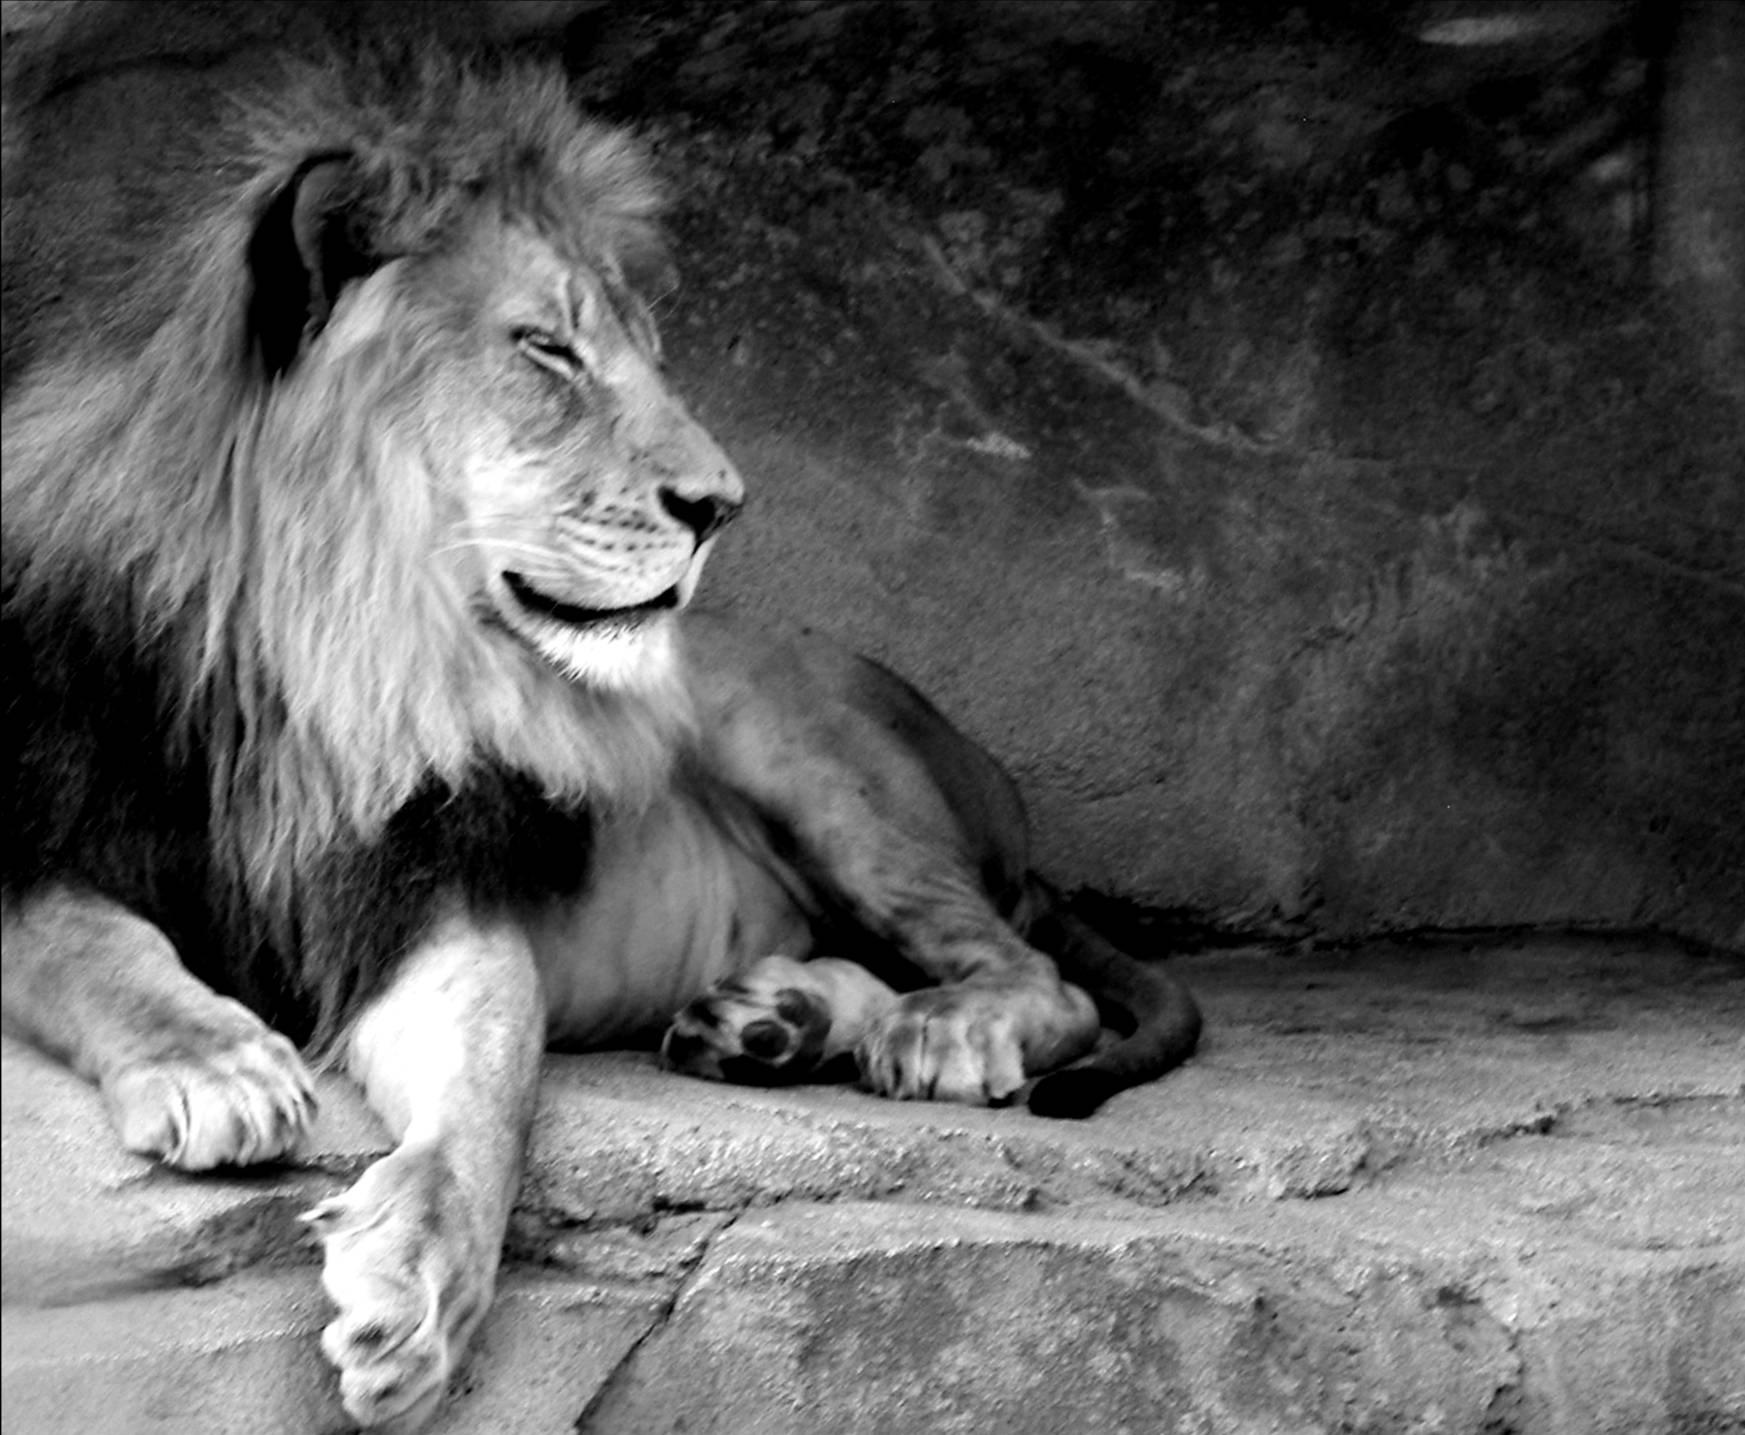 Black and white lion roar wallpaper high quality wallpaperhd 1745x1435